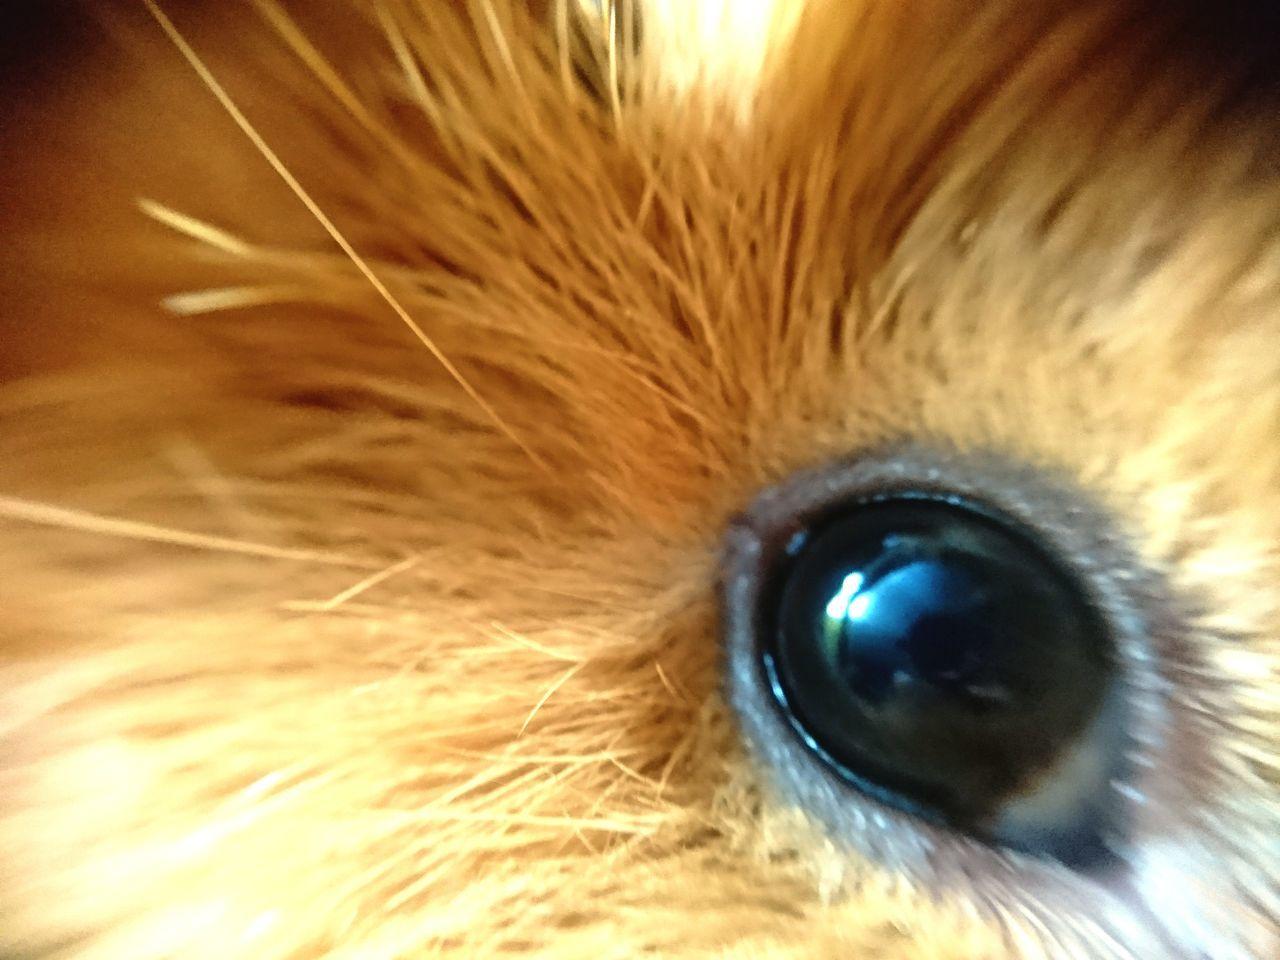 Eyelash Eyesight Full Frame Iris - Eye Close-up 365days365photos Sony Xperia Xz This Week On Eyeem Personal Perspective Domestic Animals Pets Macro_collection Nature_collection EyeEm Best Shots EyeEm Nature Lover Guineapiglove Guinea Pig Mammal No People Happy Eye